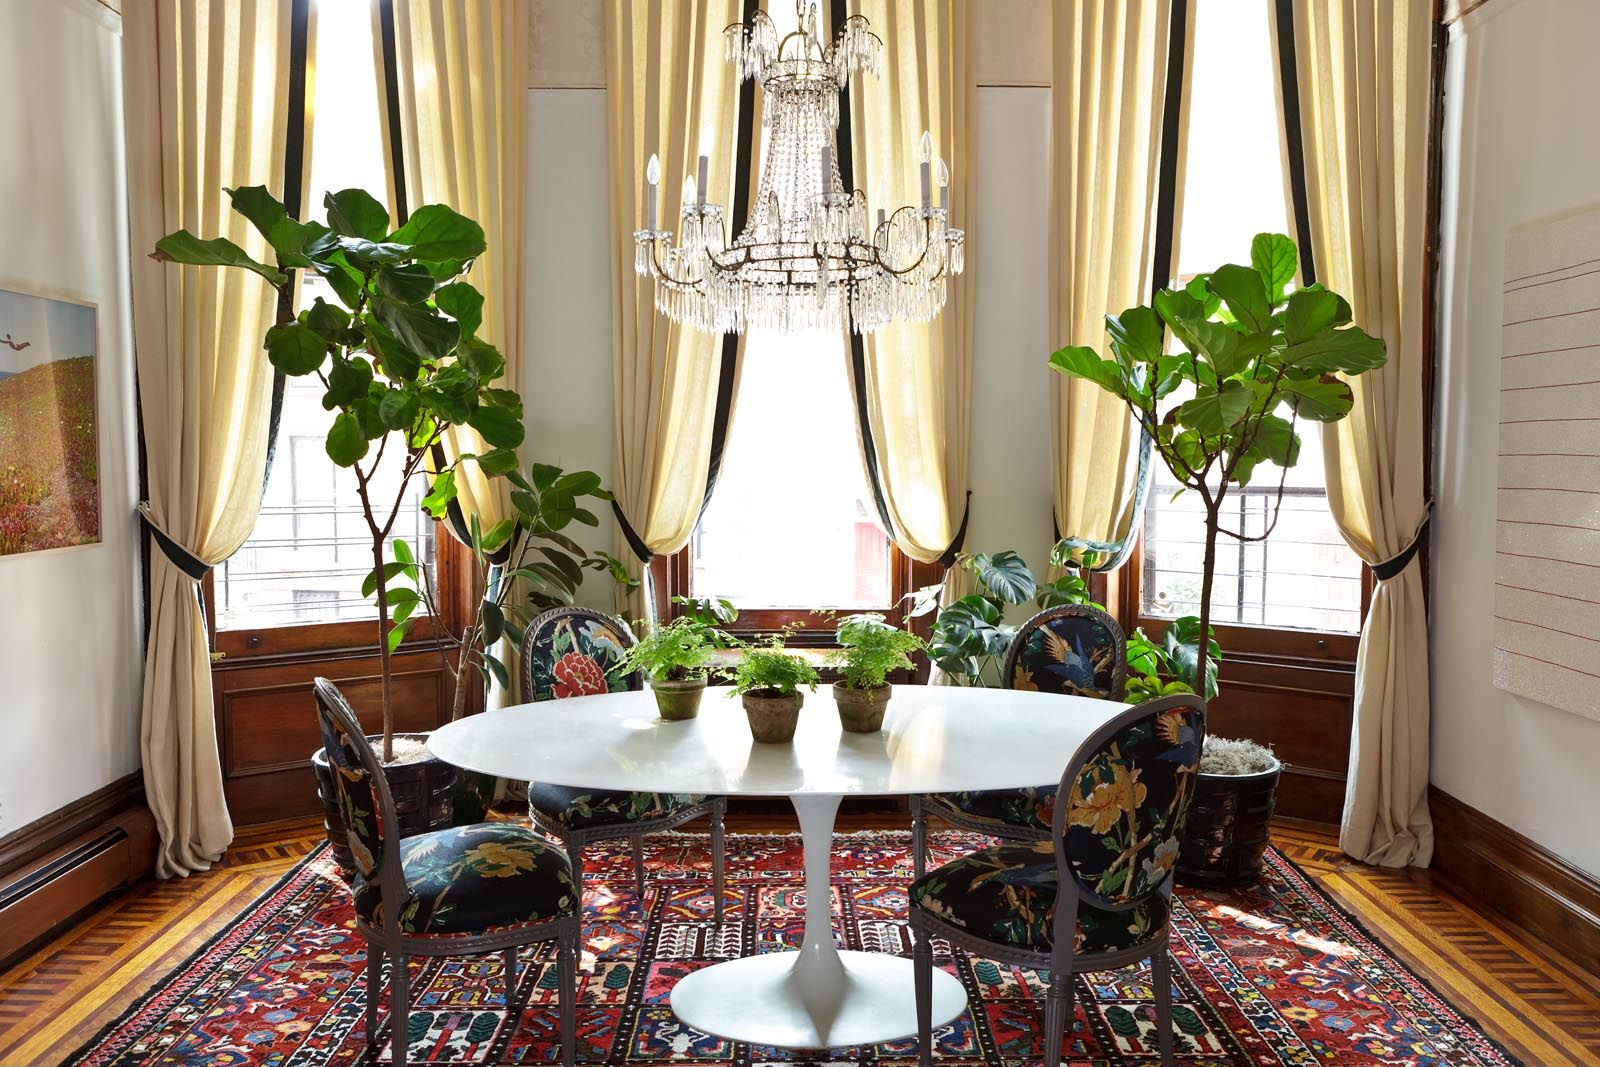 Delightful Decorative Plants